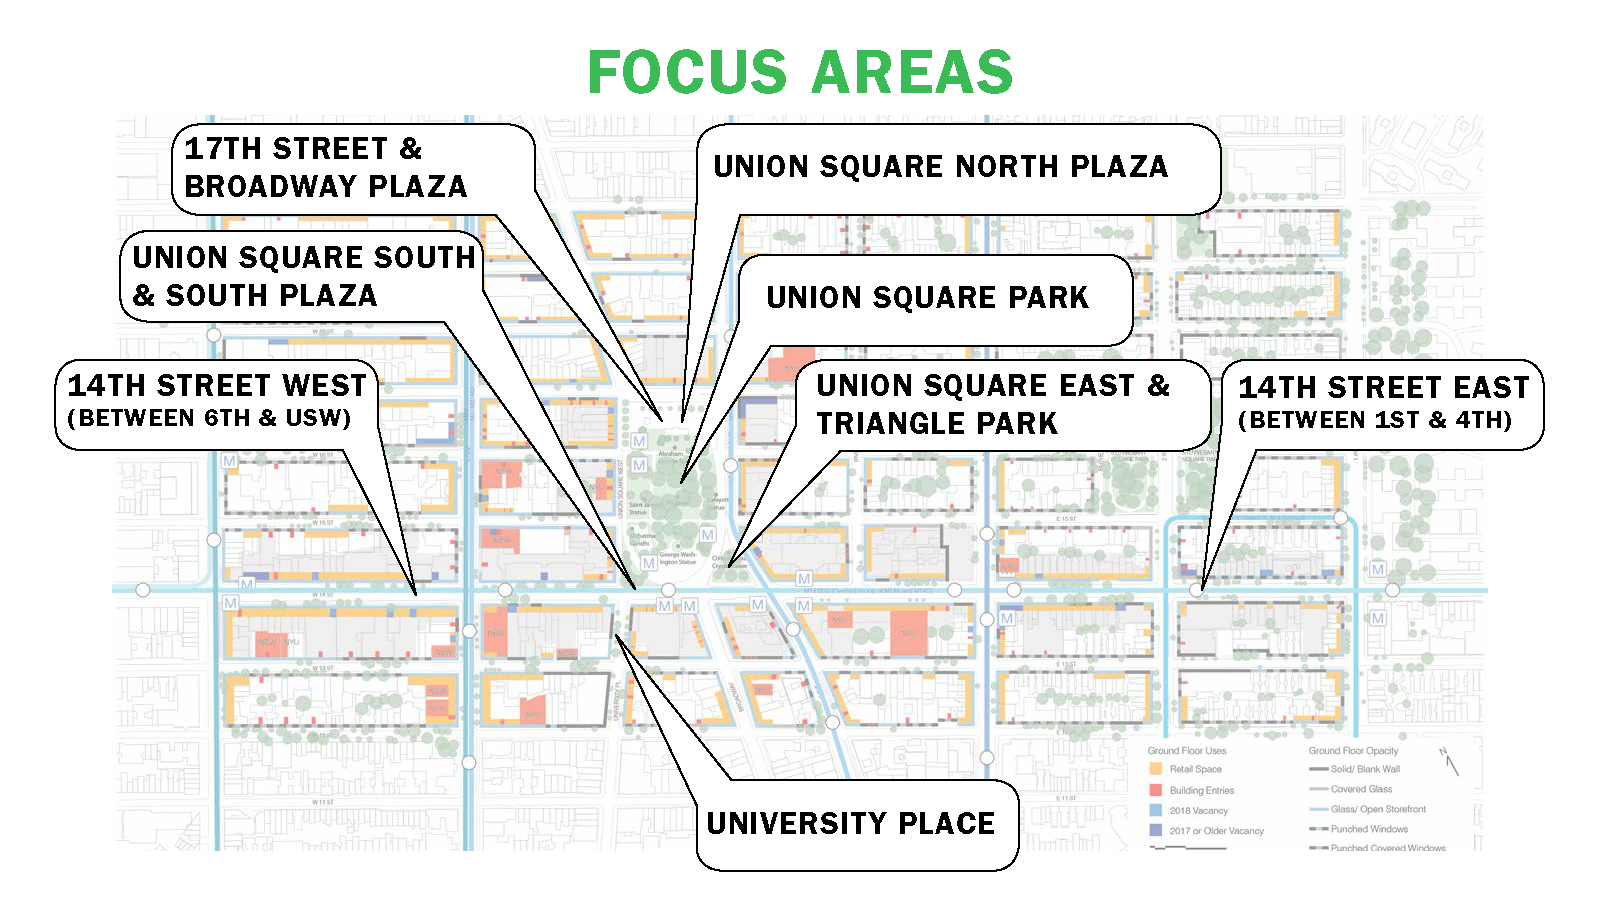 Map of Focus Areas discussed at the Community Forum